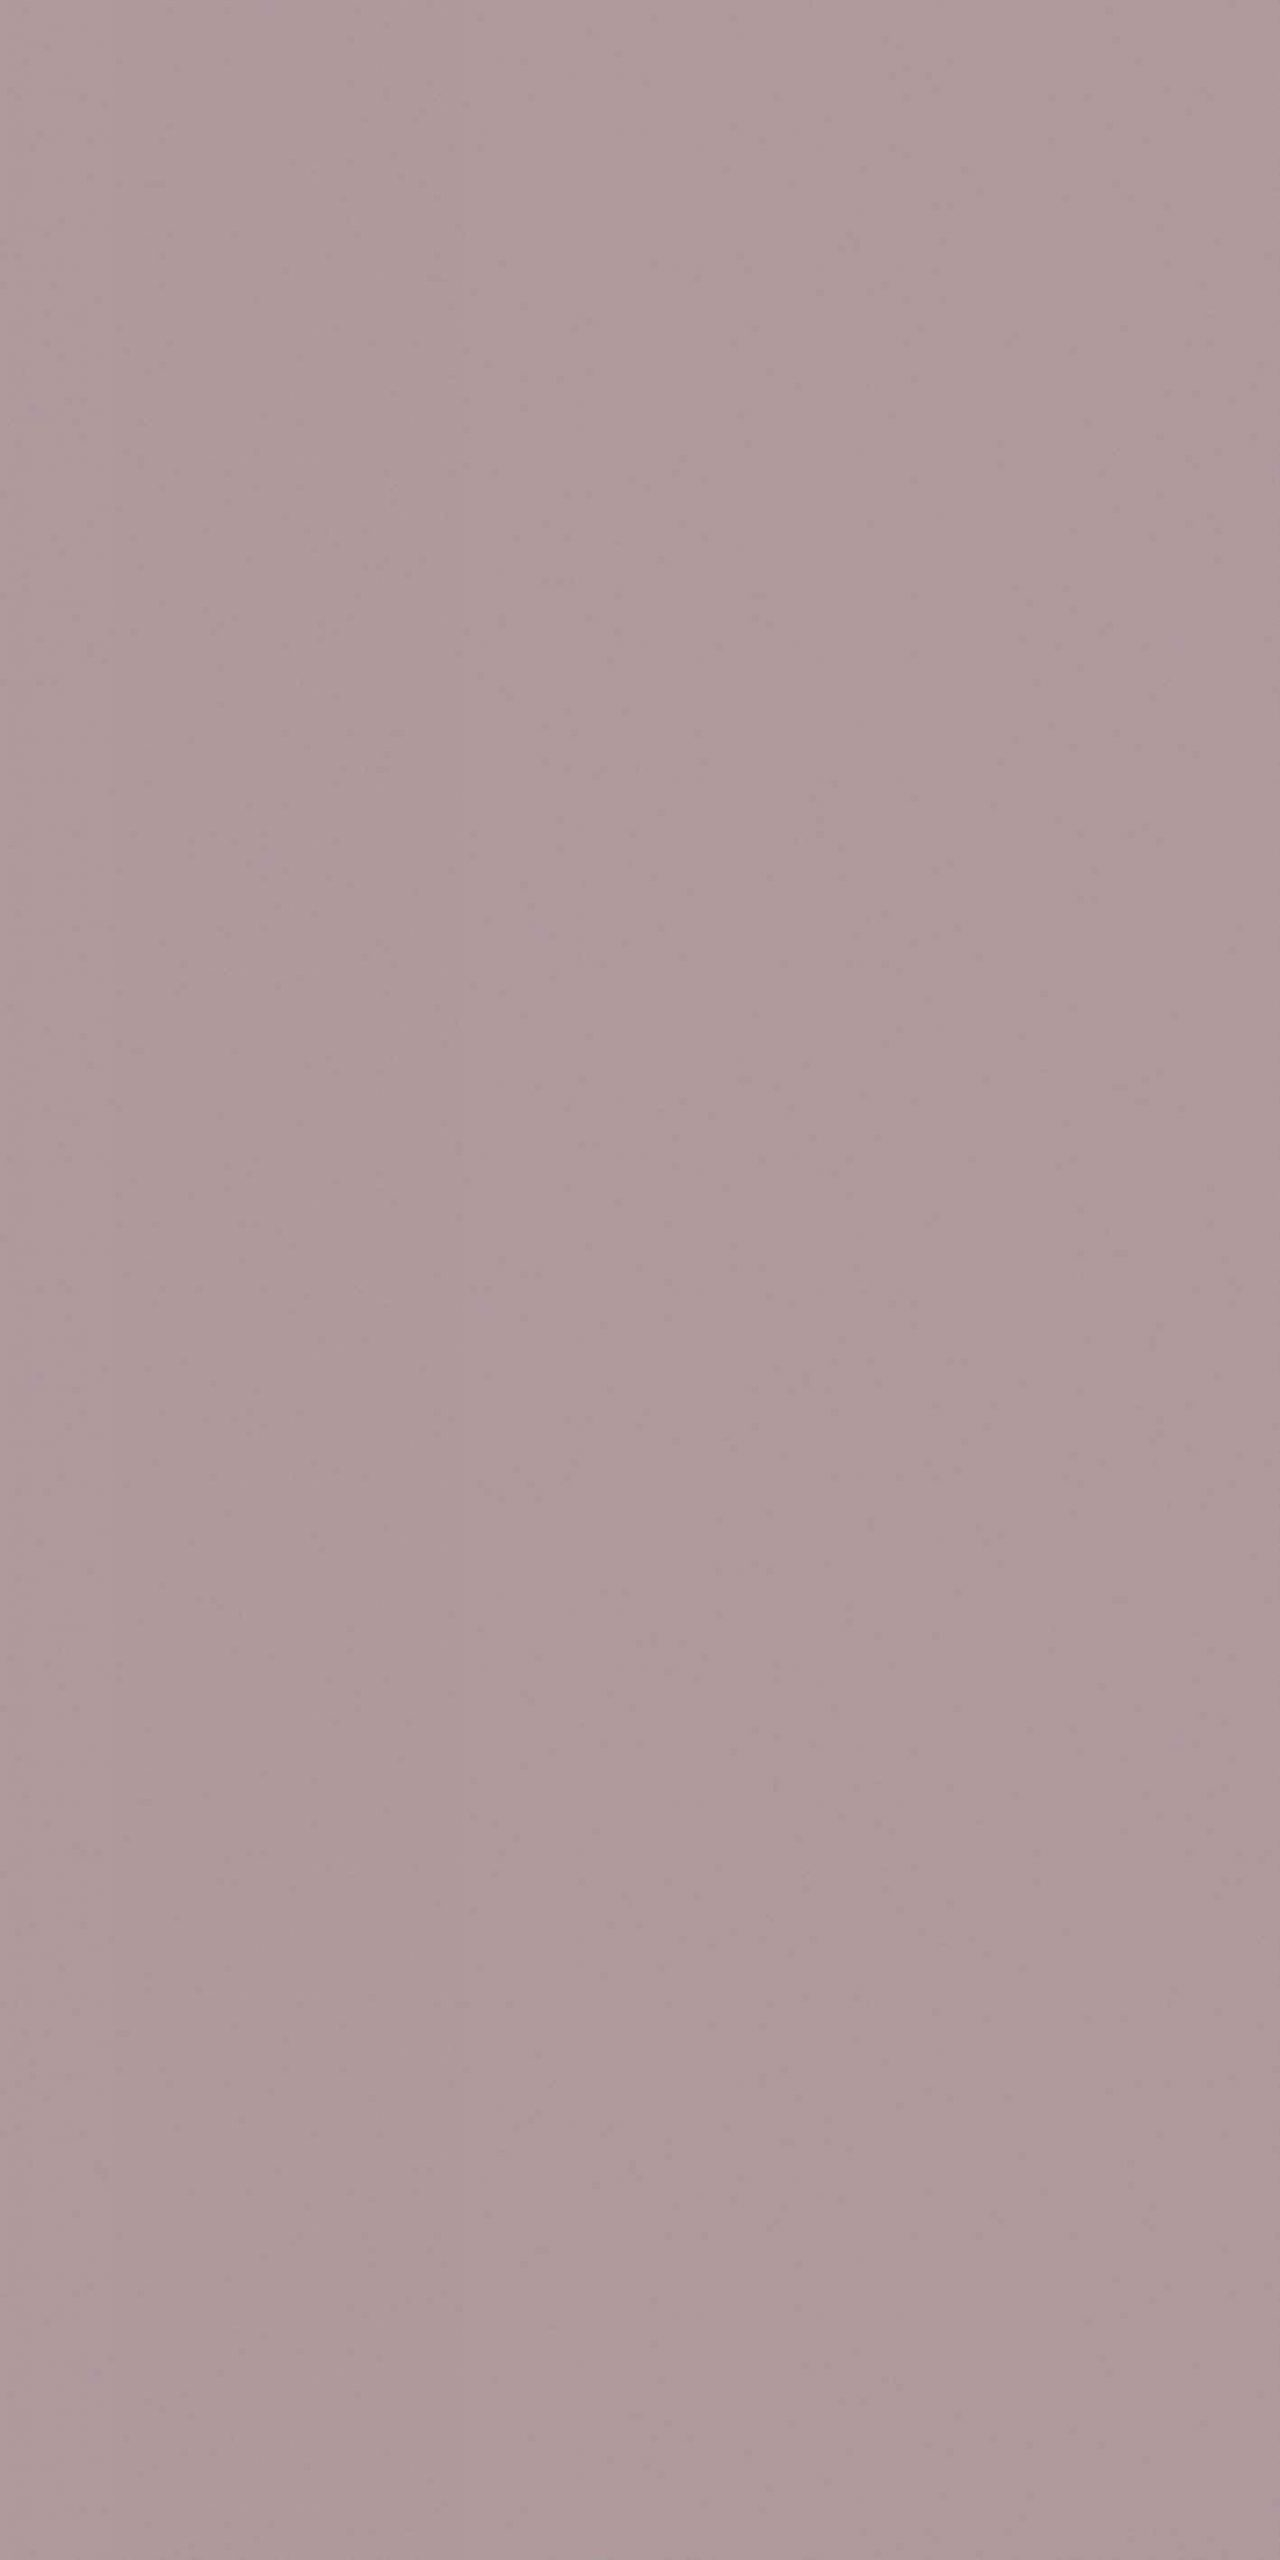 Crayons of Cerim Primrose Matte 6mm 120 x 240